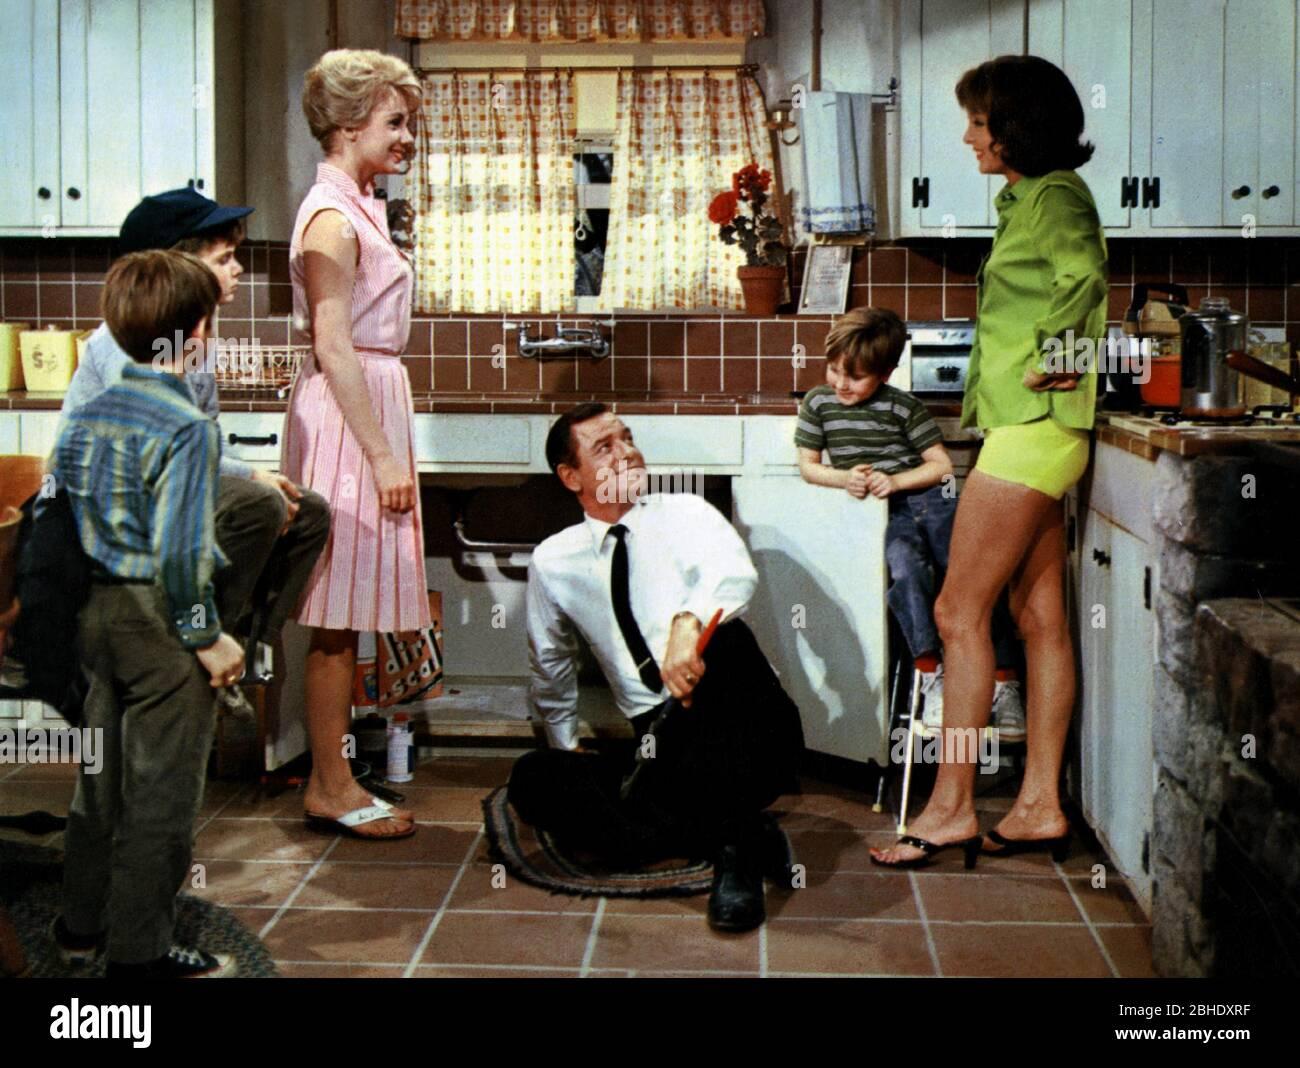 SHIRLEY JONES, GIG YOUNG, CAROLYN JONES, A TICKLISH AFFAIR, 1963 Stock  Photo - Alamy